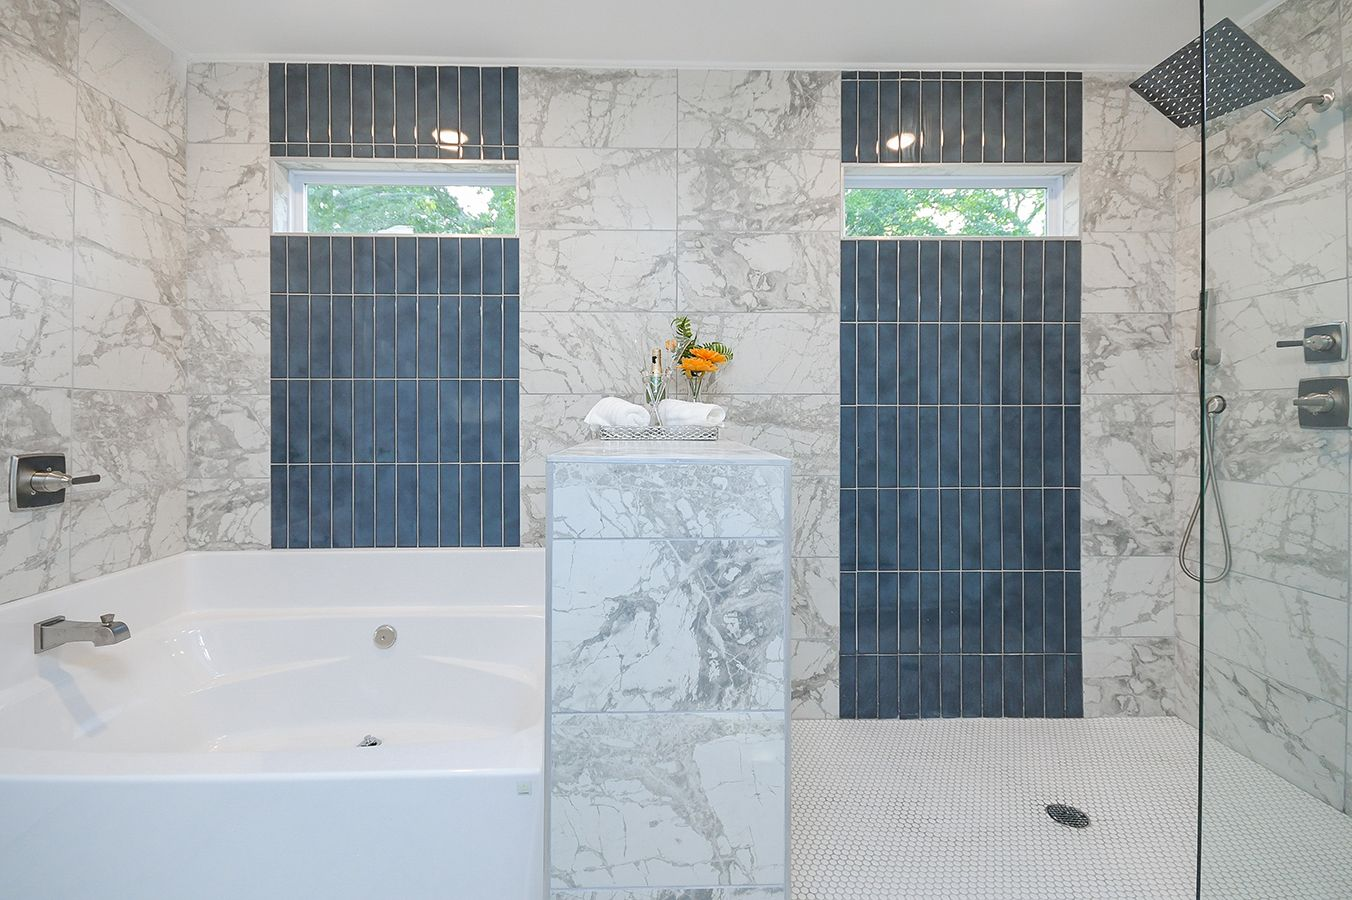 Upper_Level_Master_Bathroom_view5_.jpg